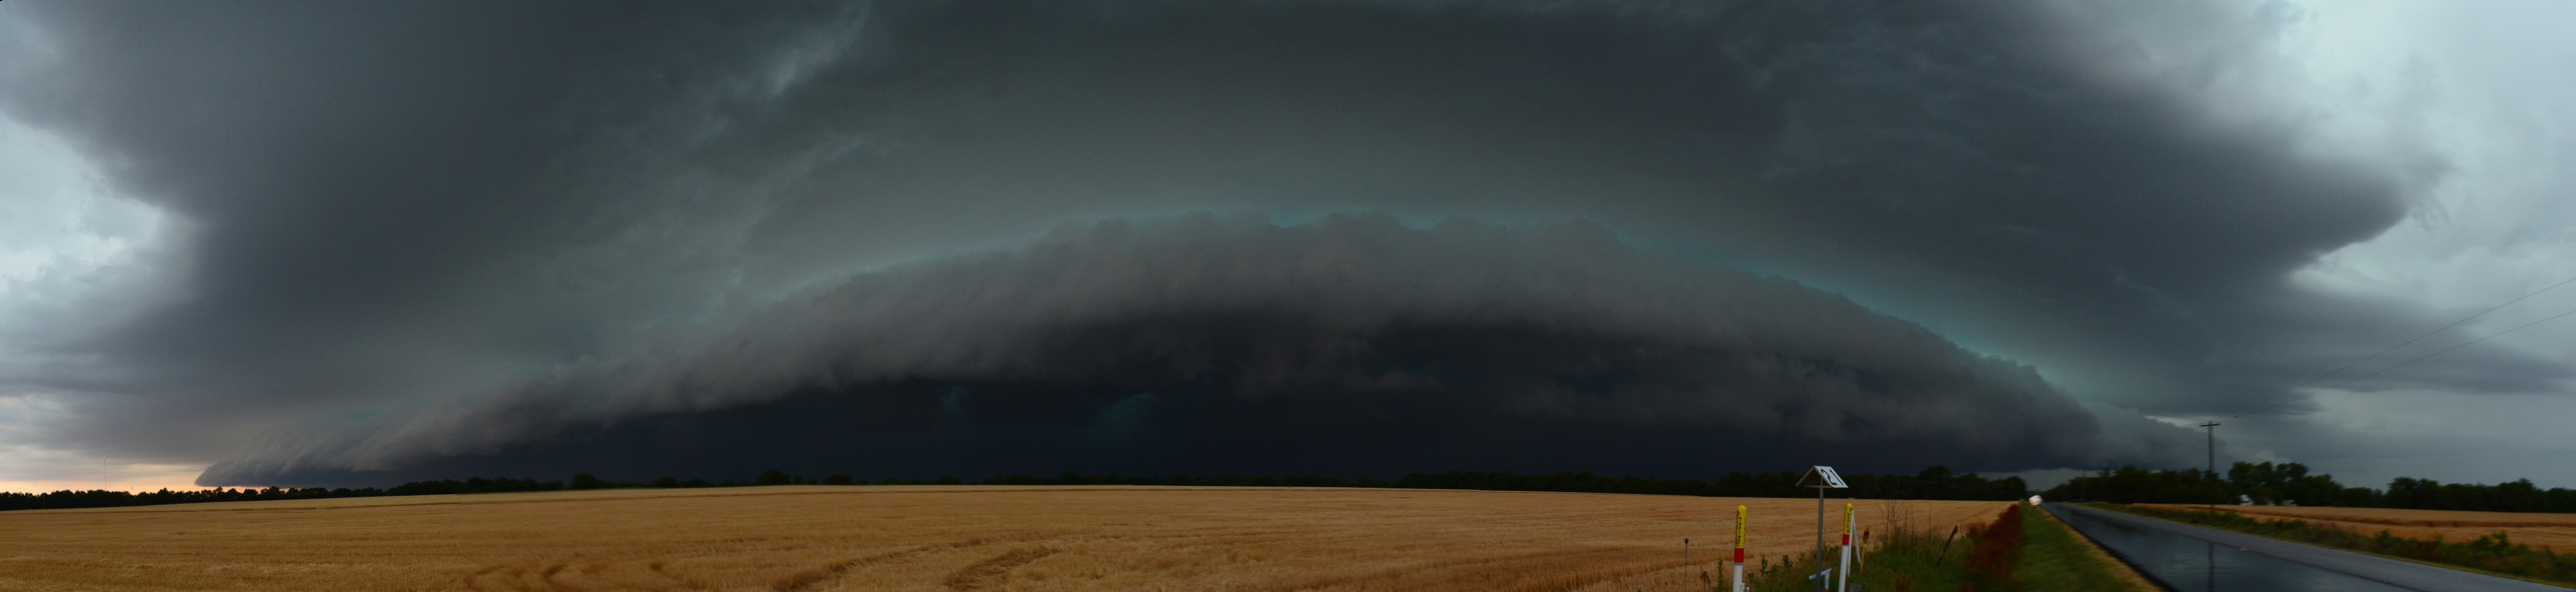 storm_approach